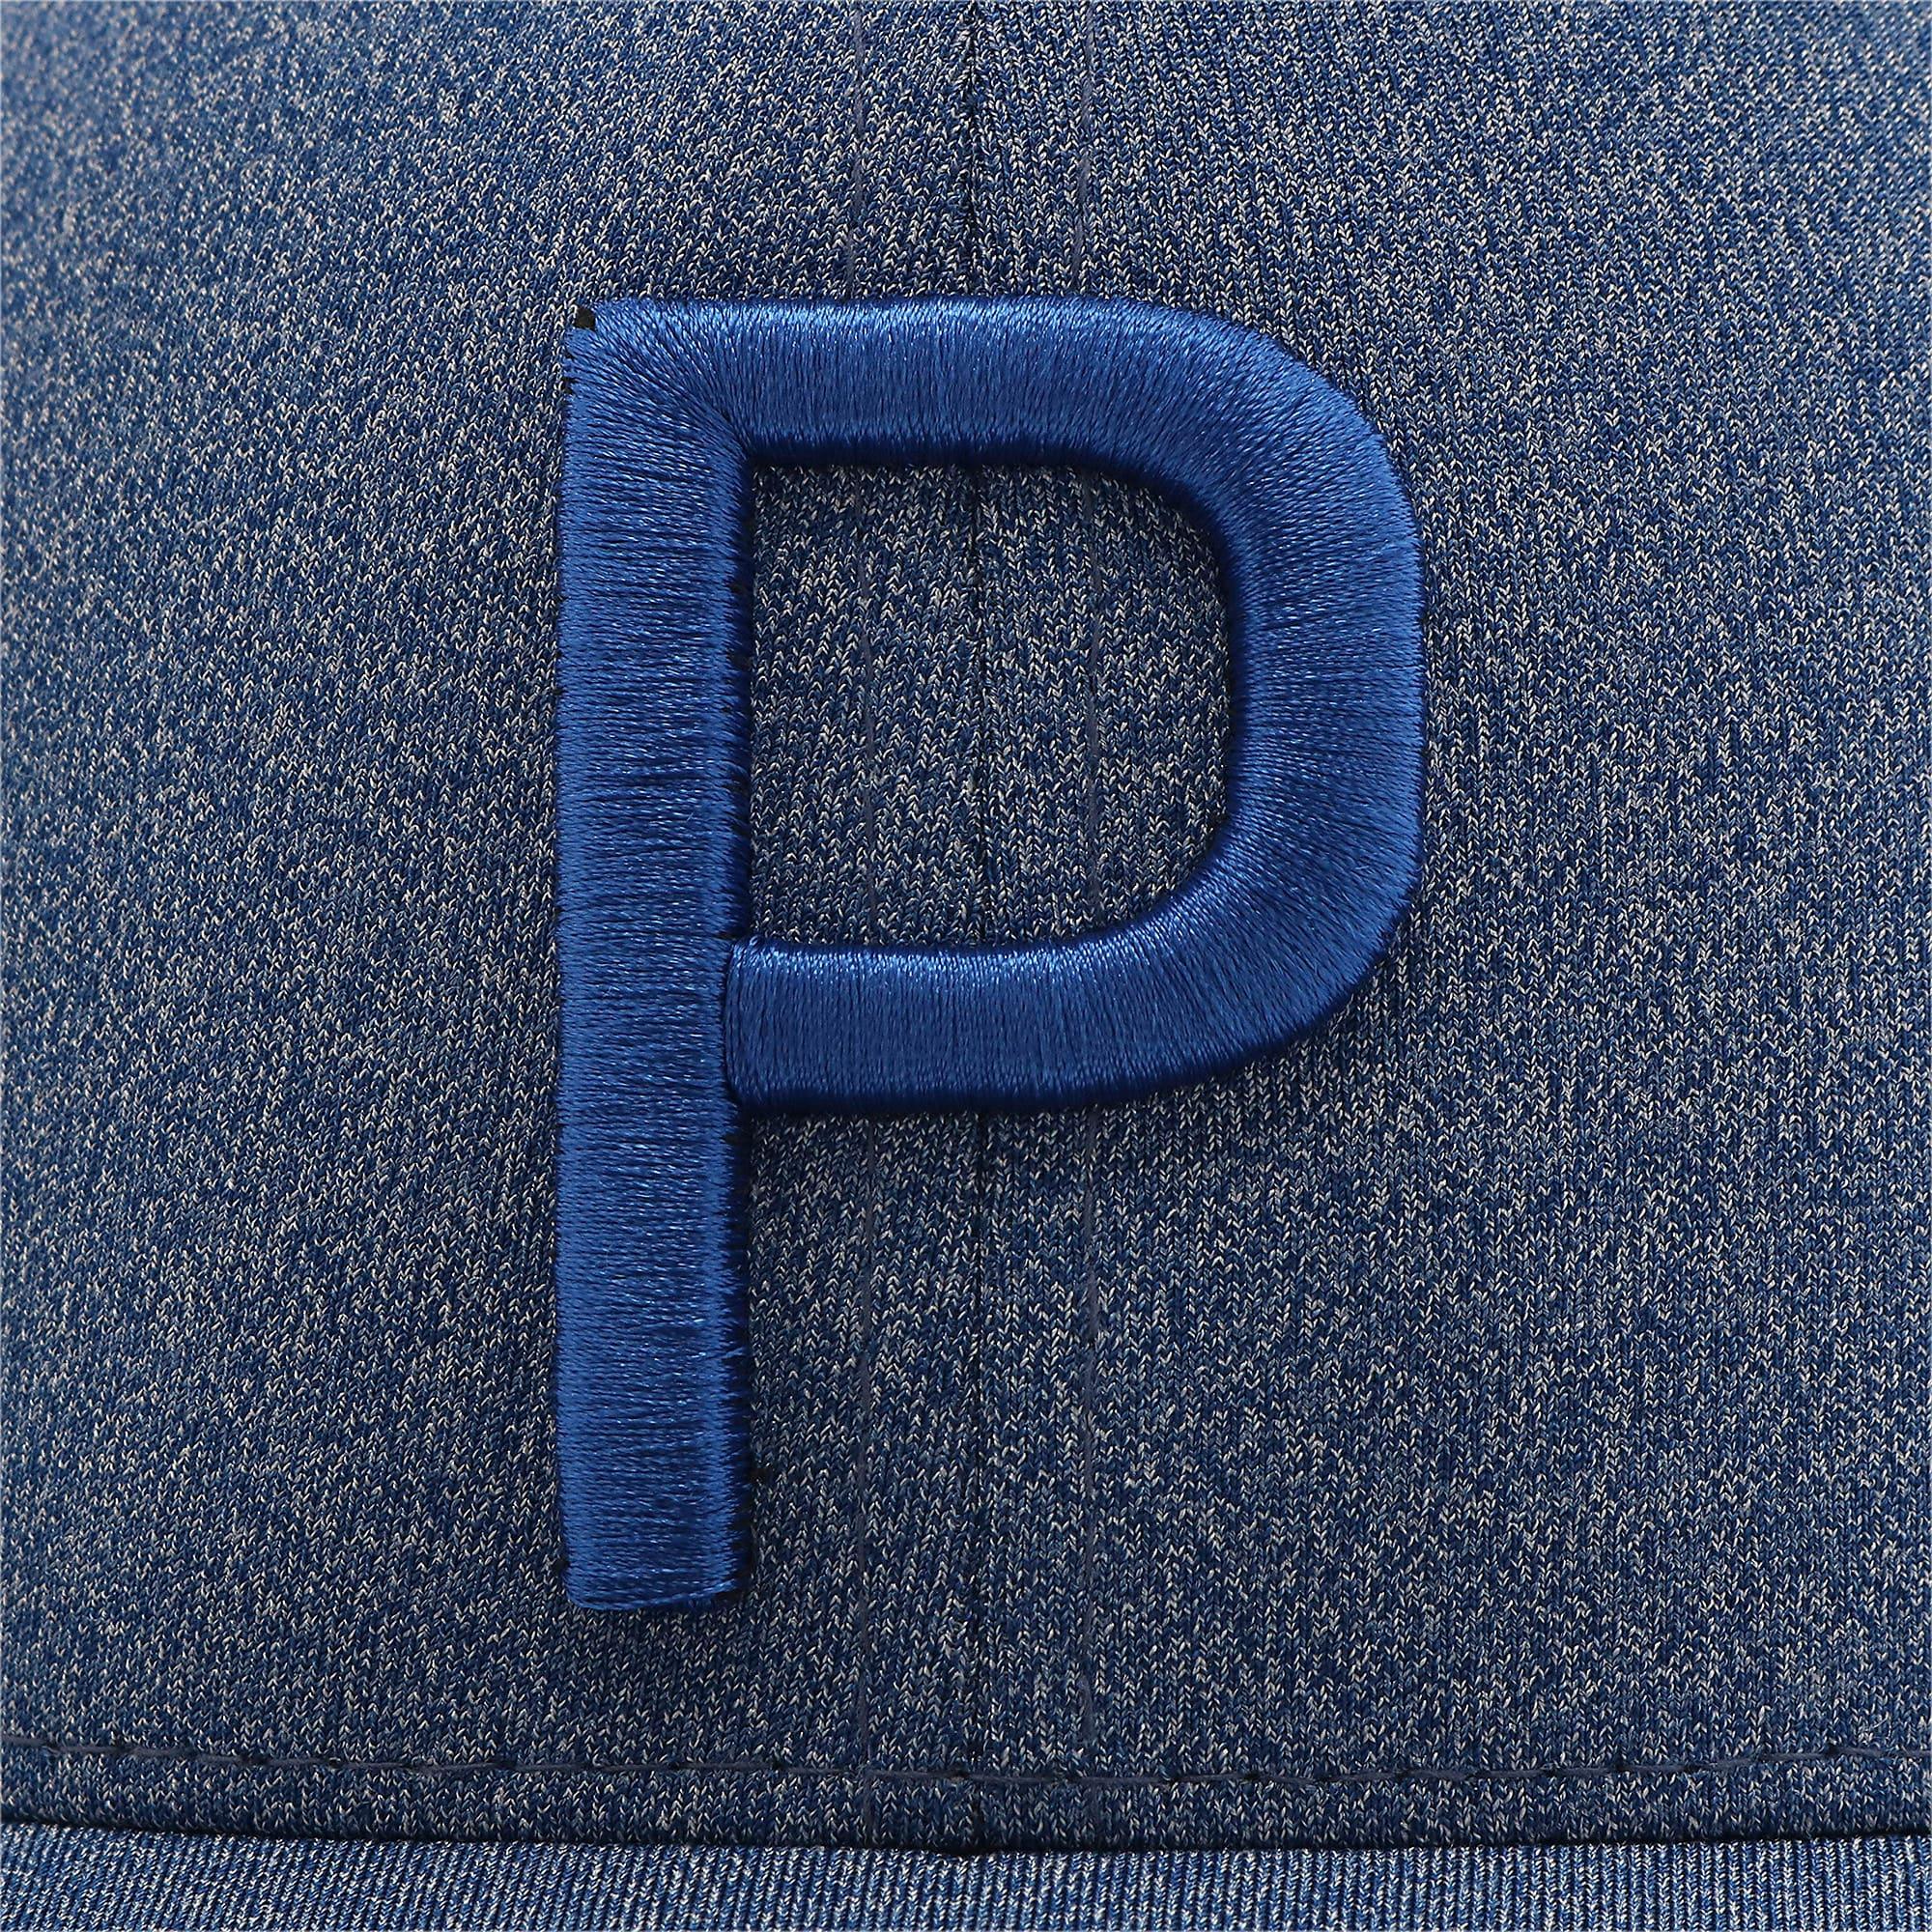 Thumbnail 5 of ゴルフ Pマークスナップバックキャップ, Peacoat-Dazzling Blue, medium-JPN